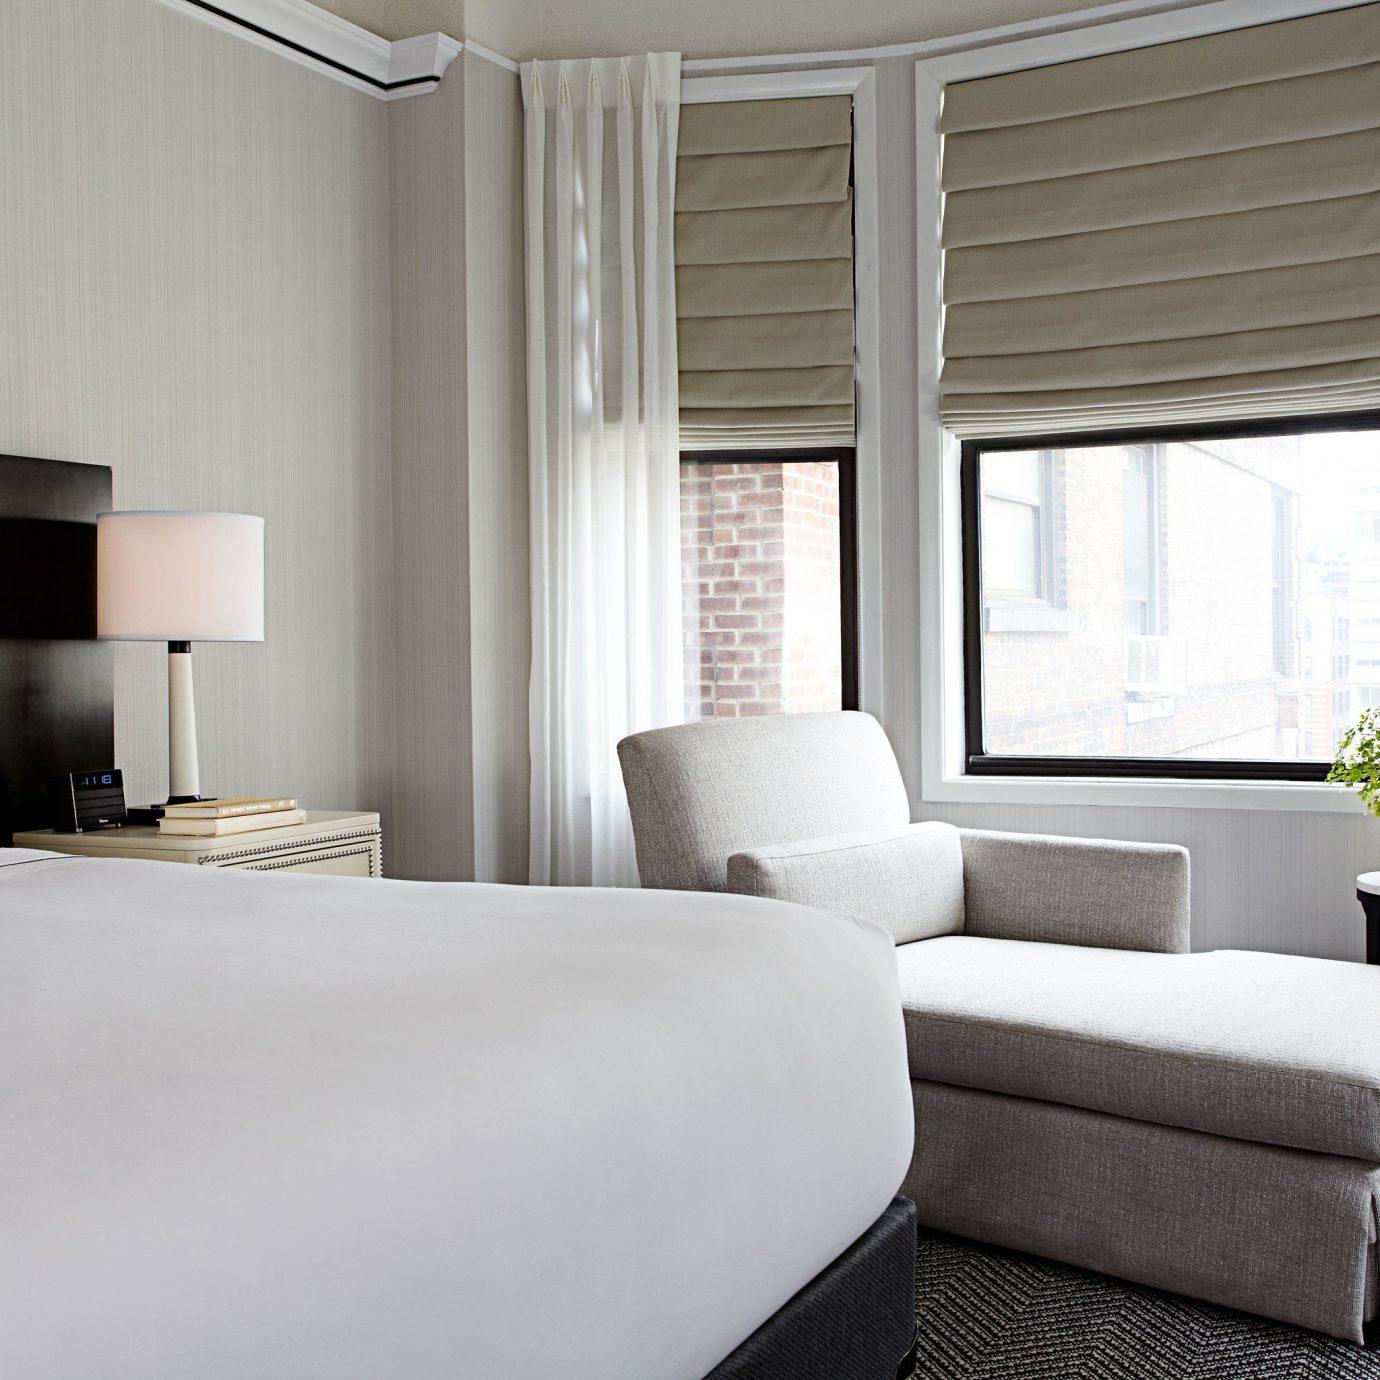 sofa property living room Bedroom home condominium Suite